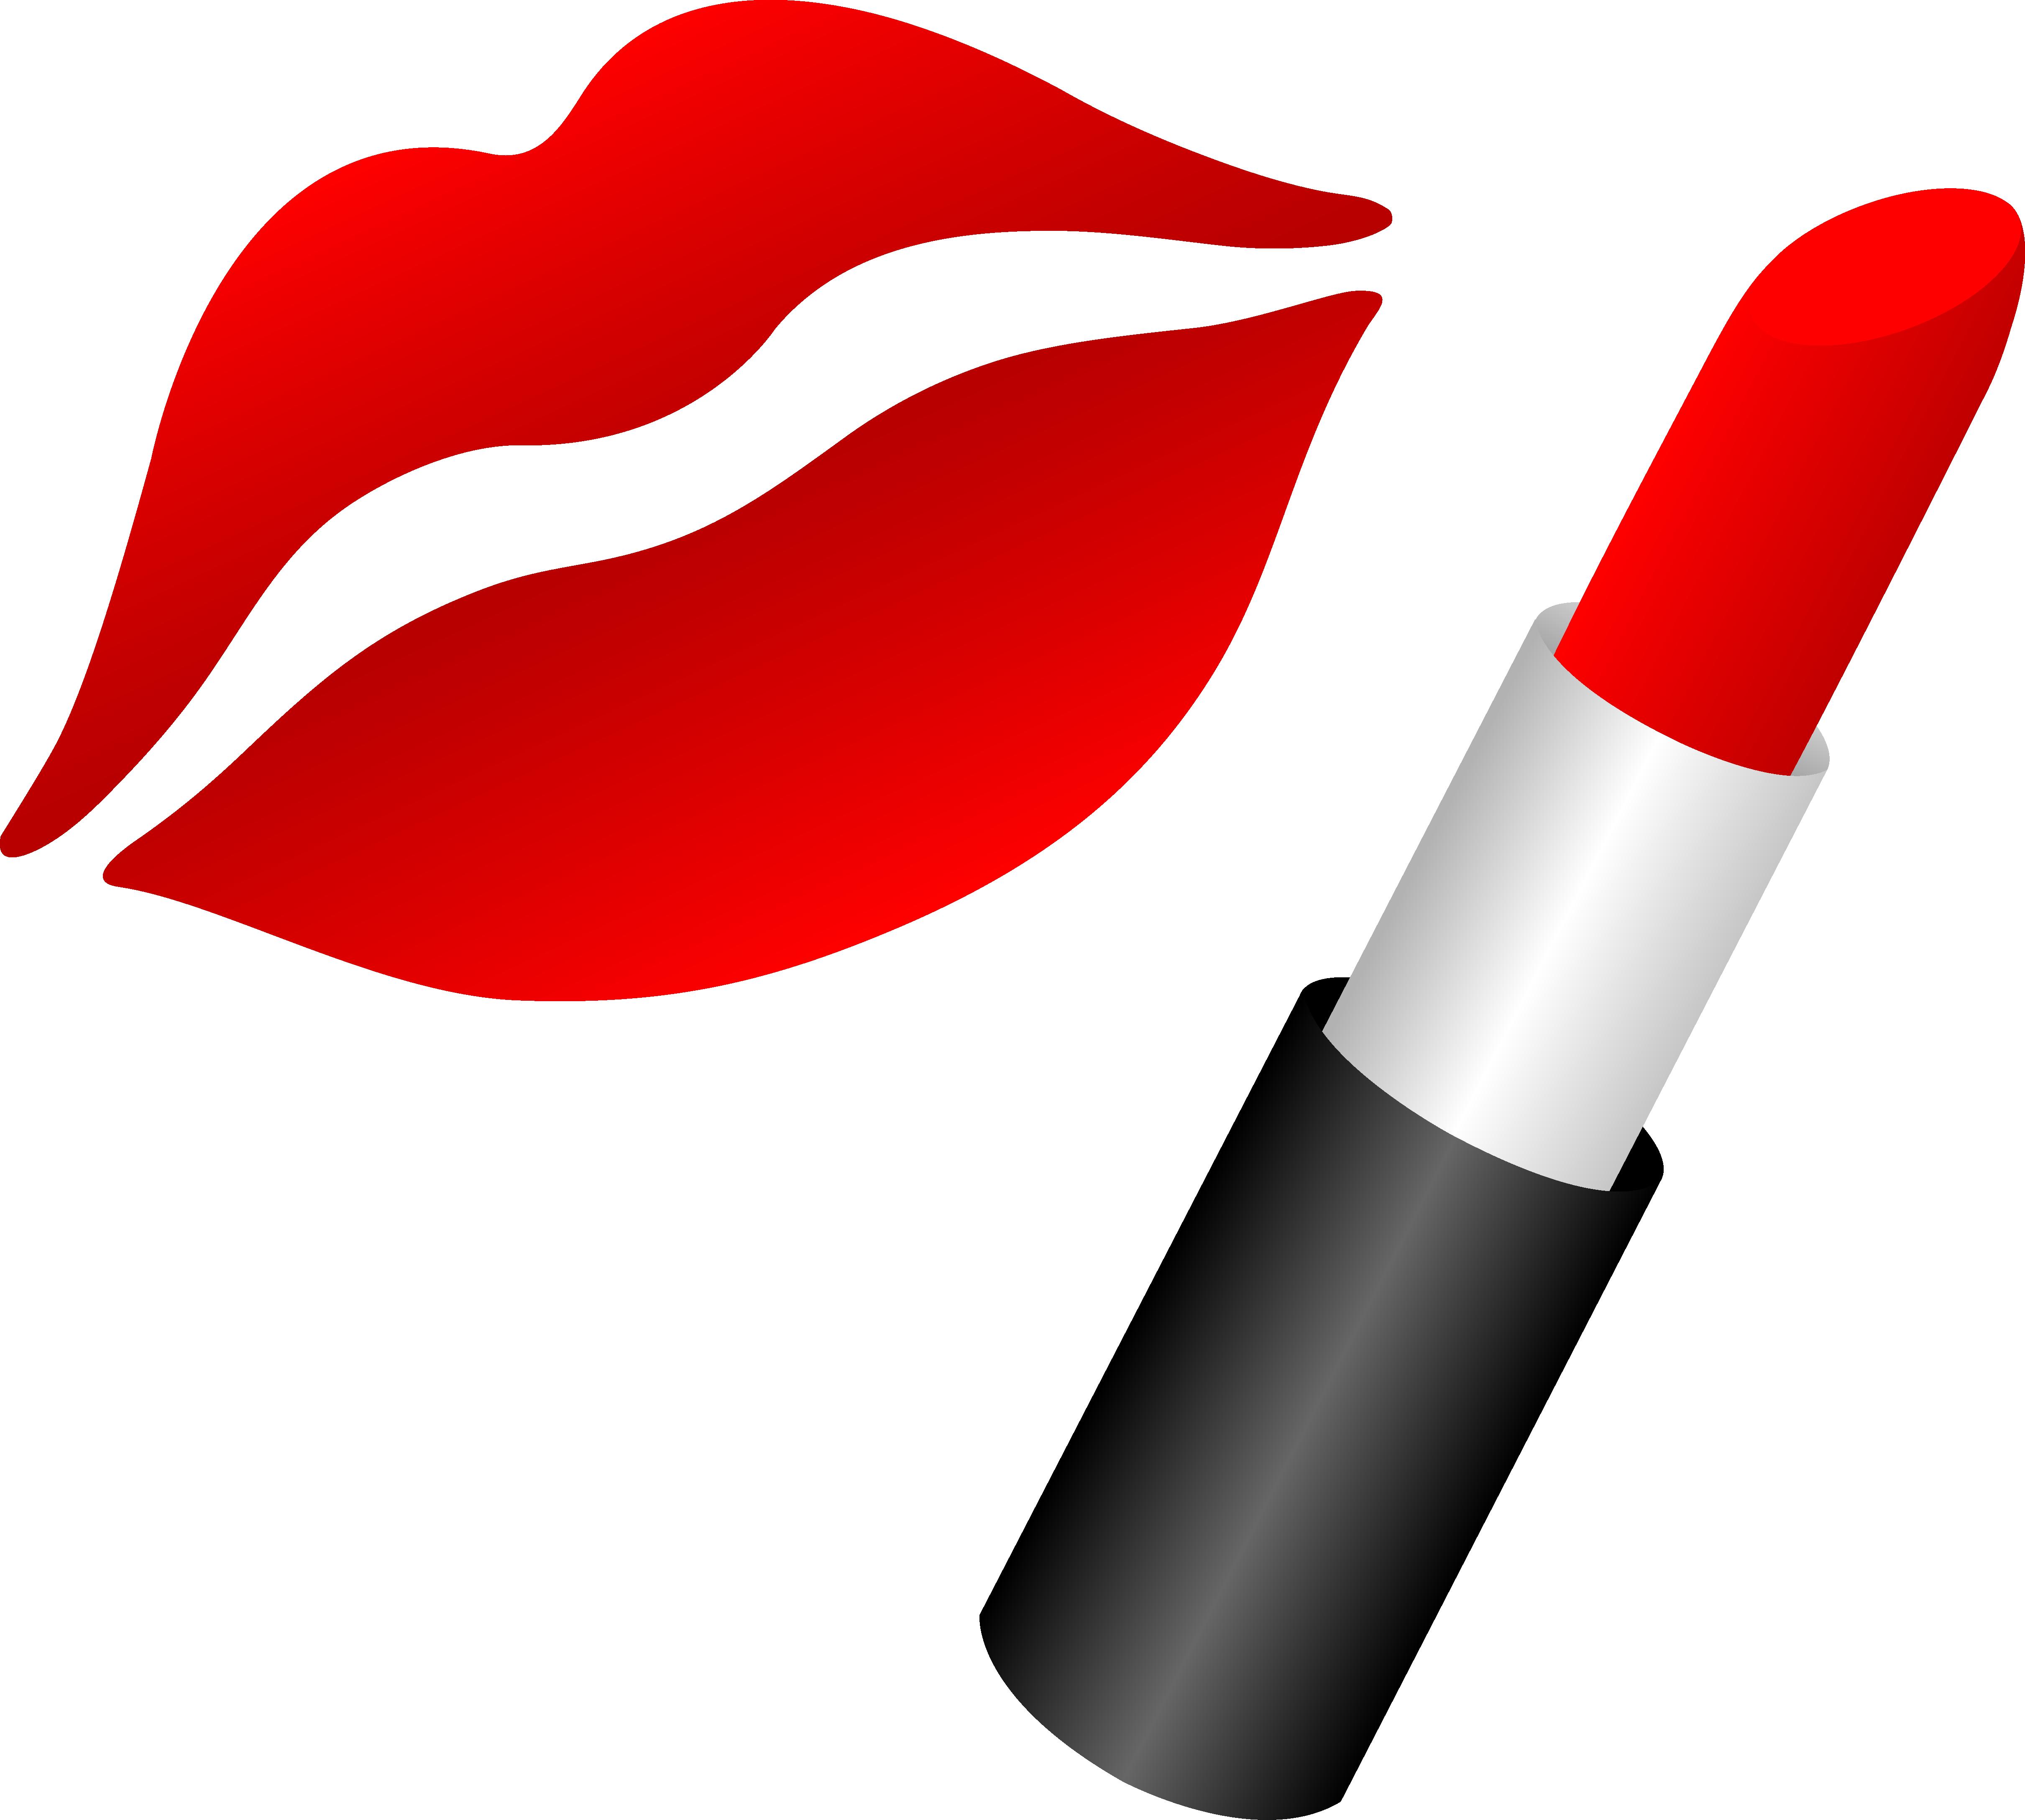 Lipstick Clipart Black And White